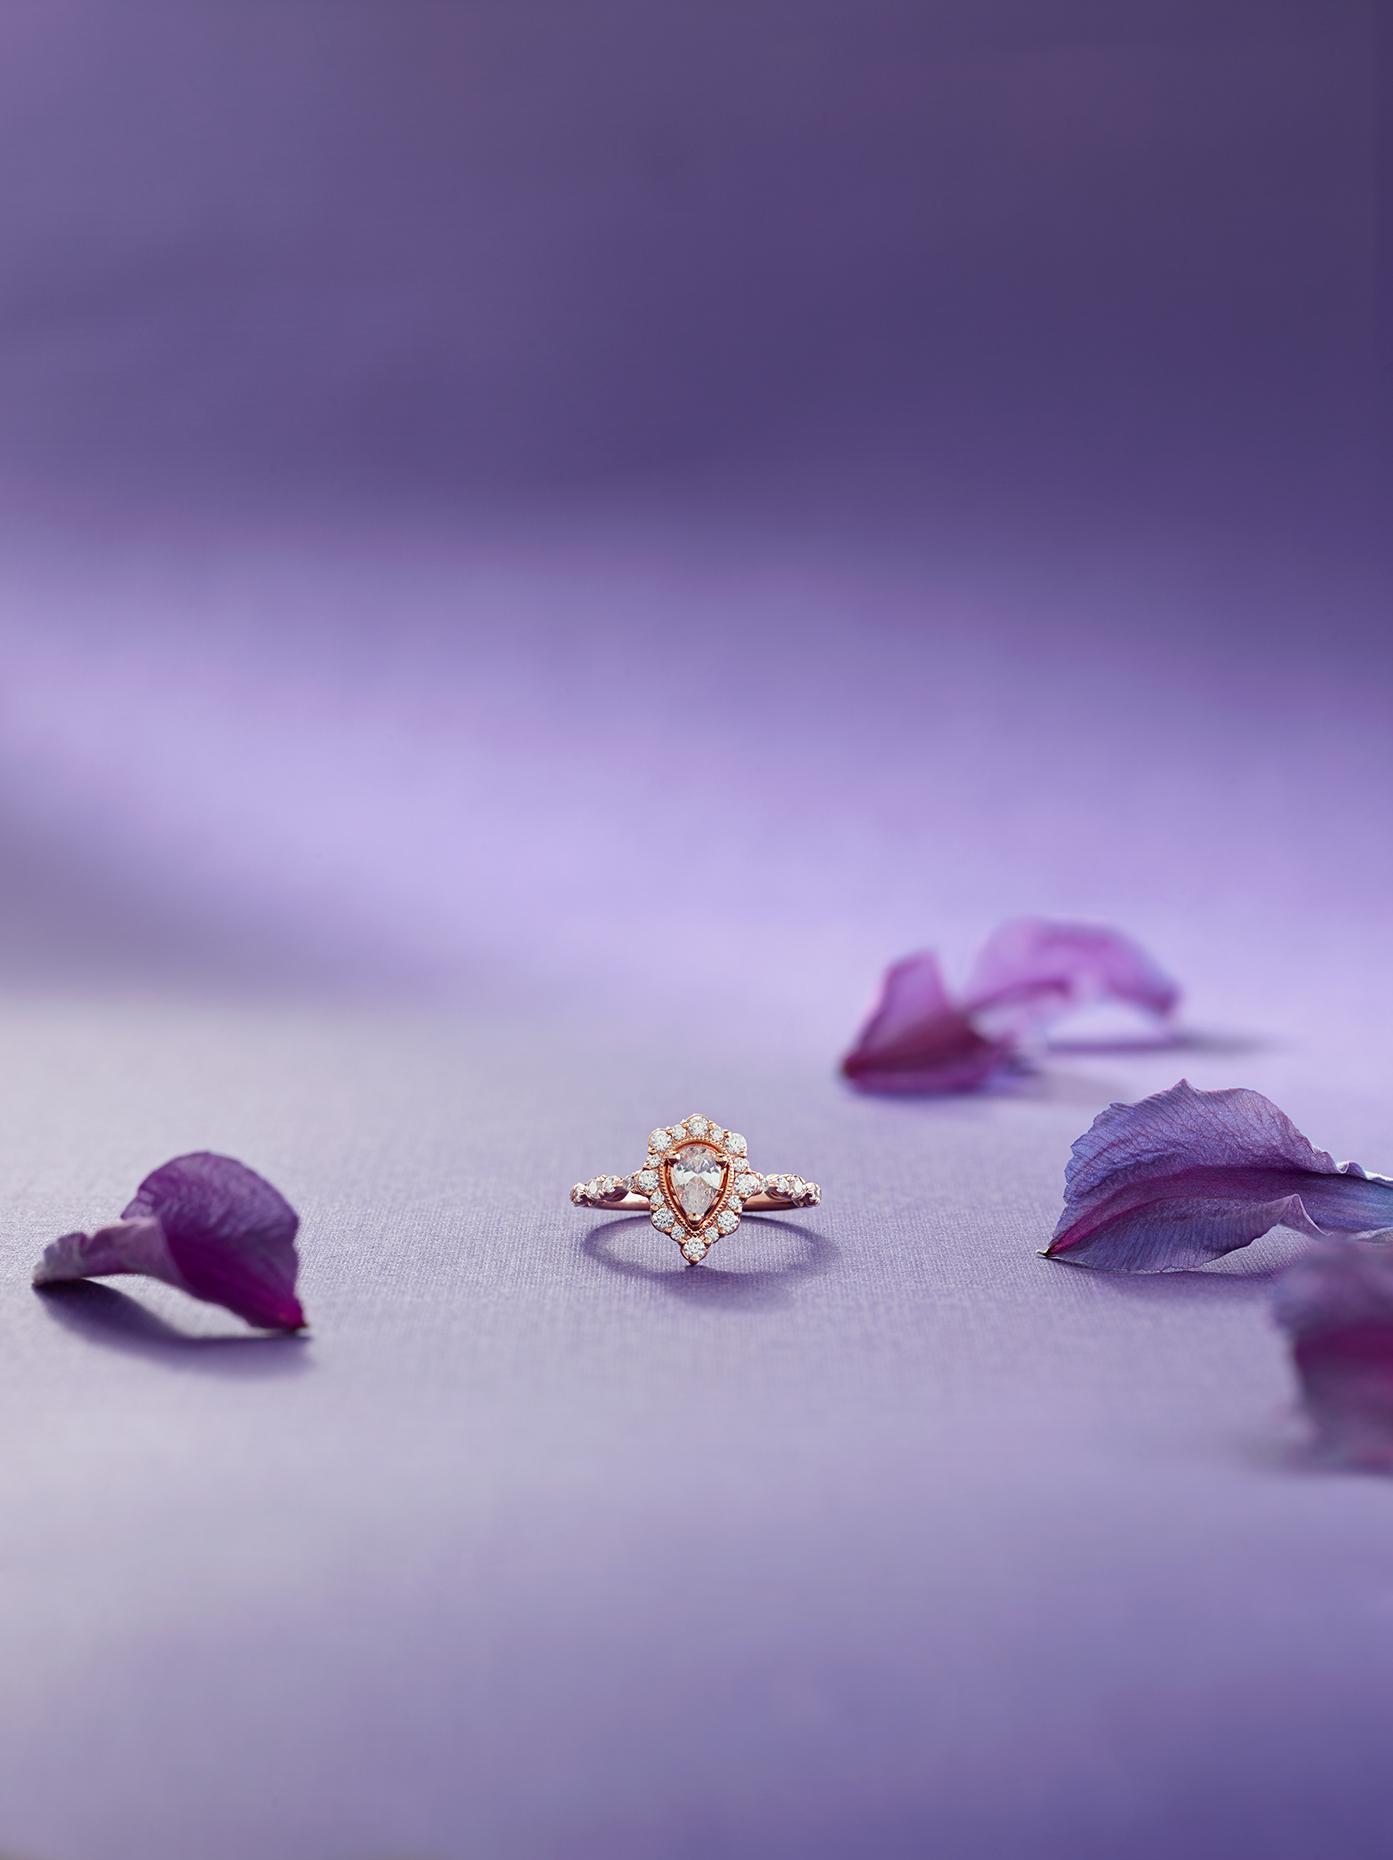 Product_photography_Jewelry_Derek_Israelsen_ZacPosen001_Diamond_.jpg